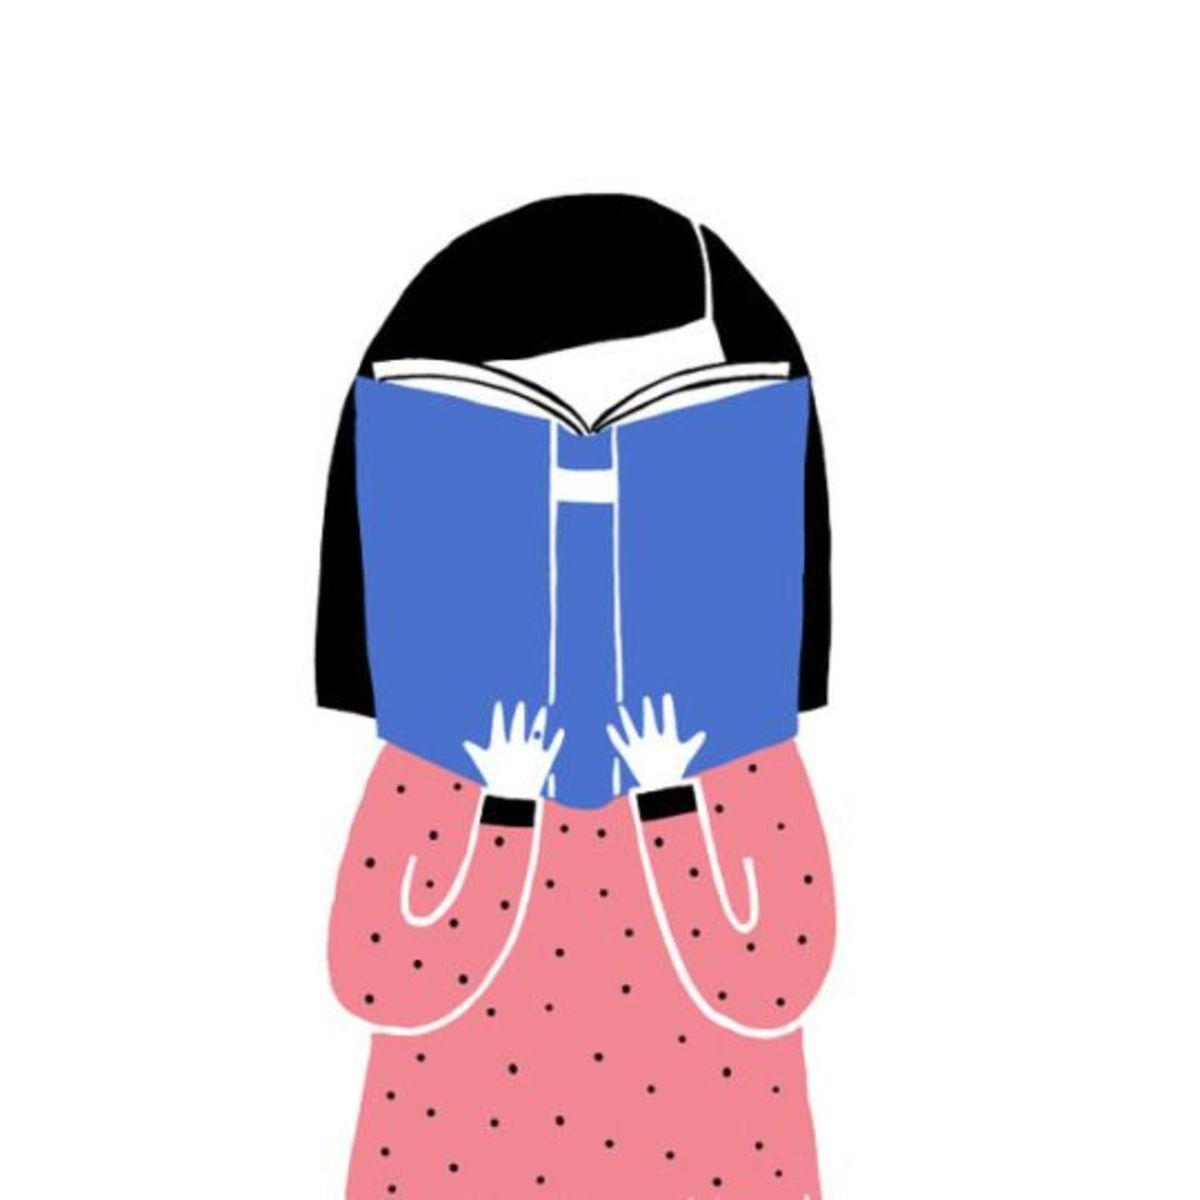 5 Life-Changing Books